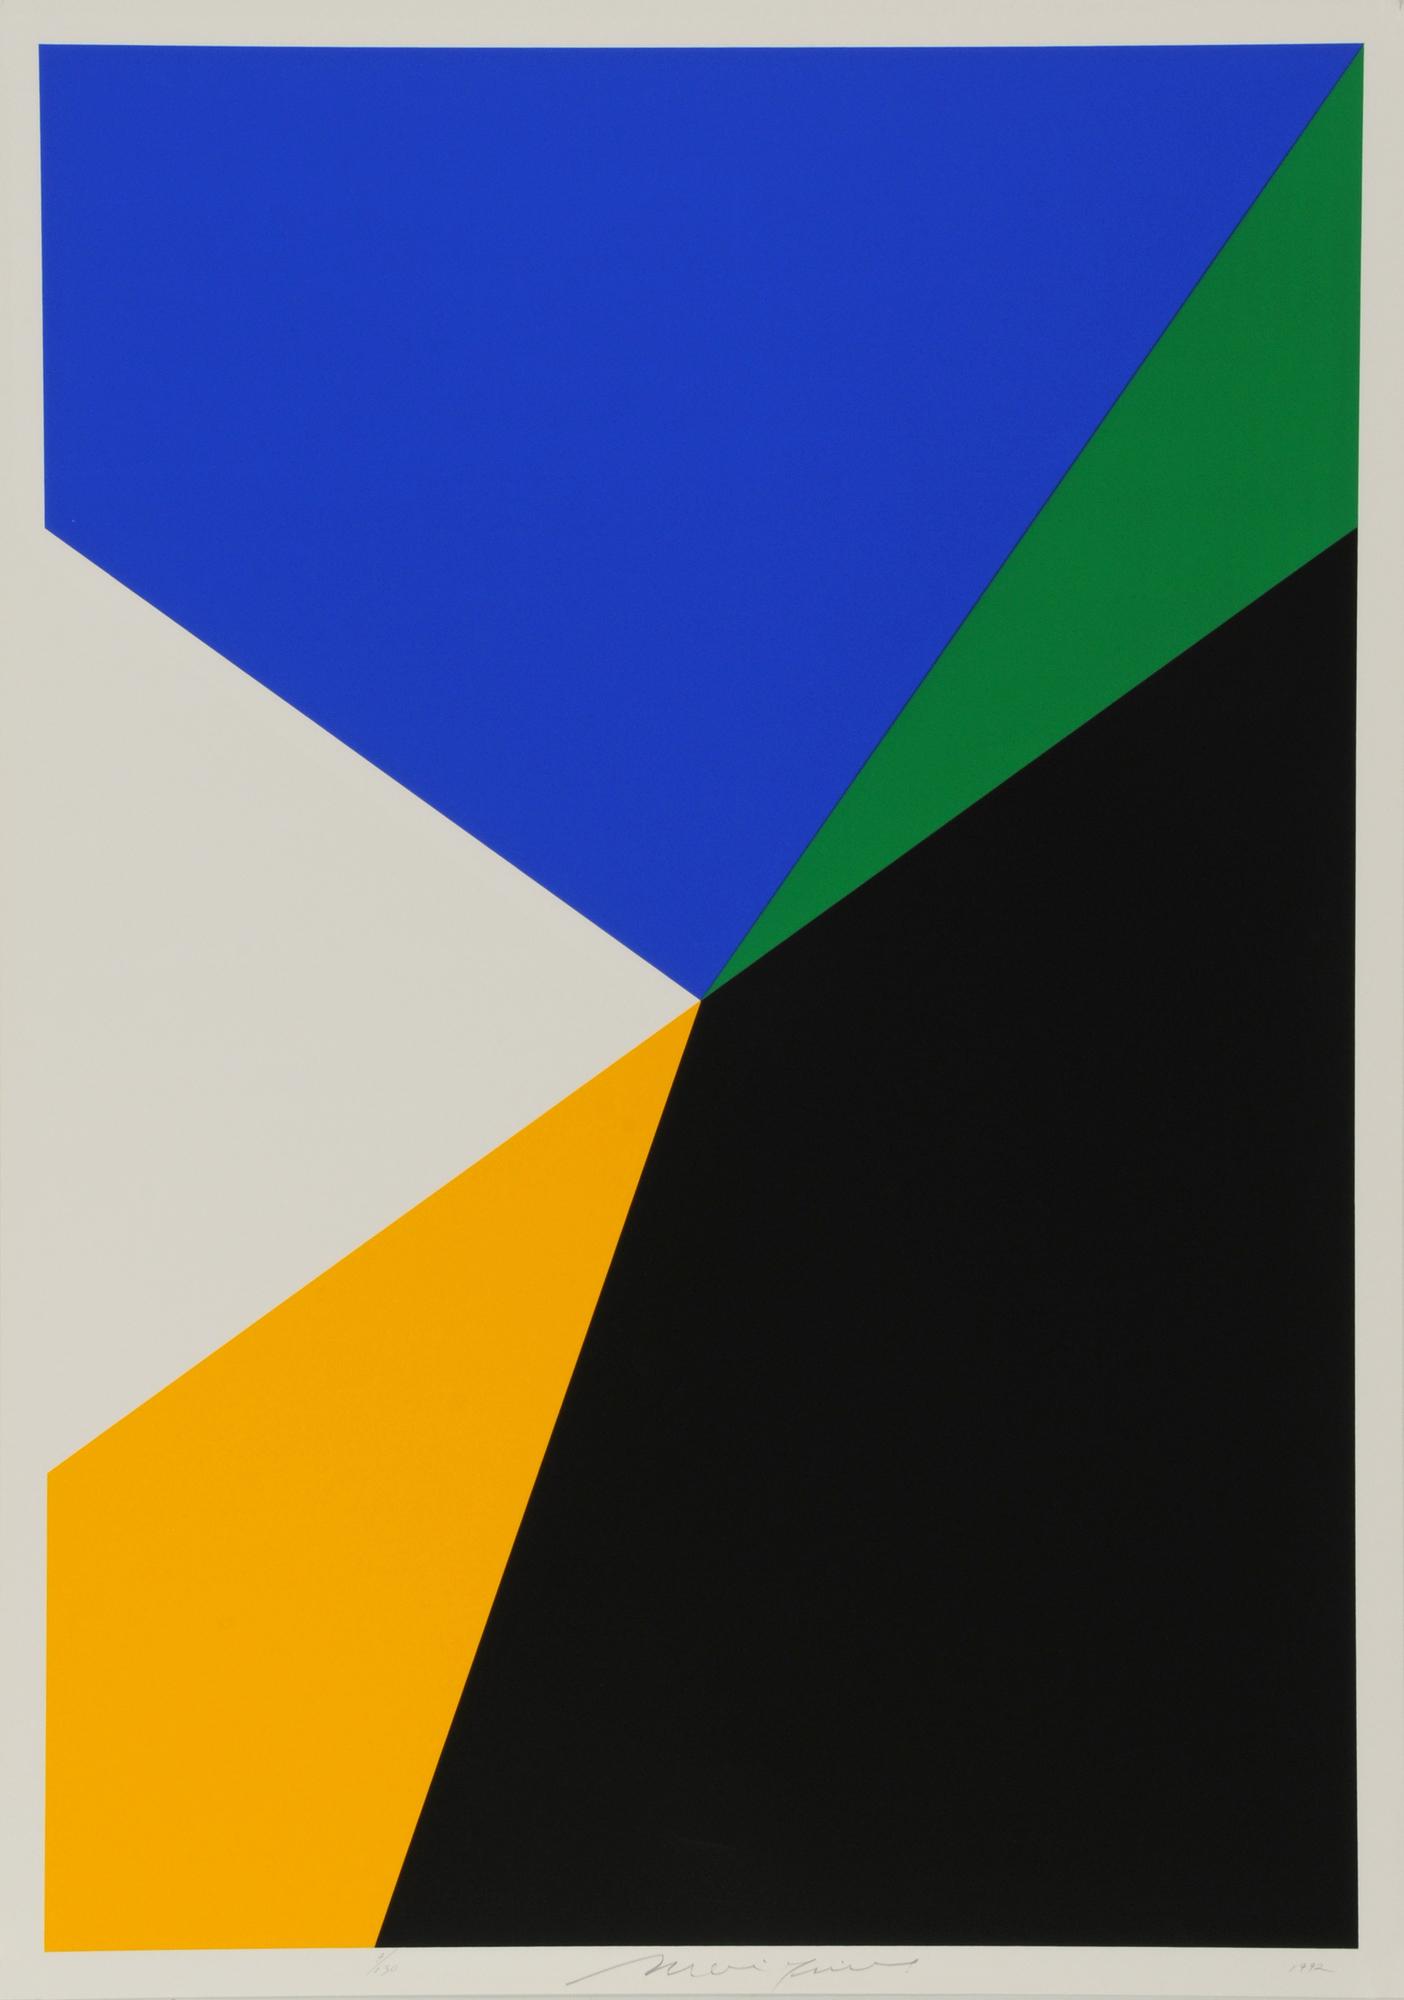 Mavignier Almir da Silva, Series of 5 sheets: Untitled